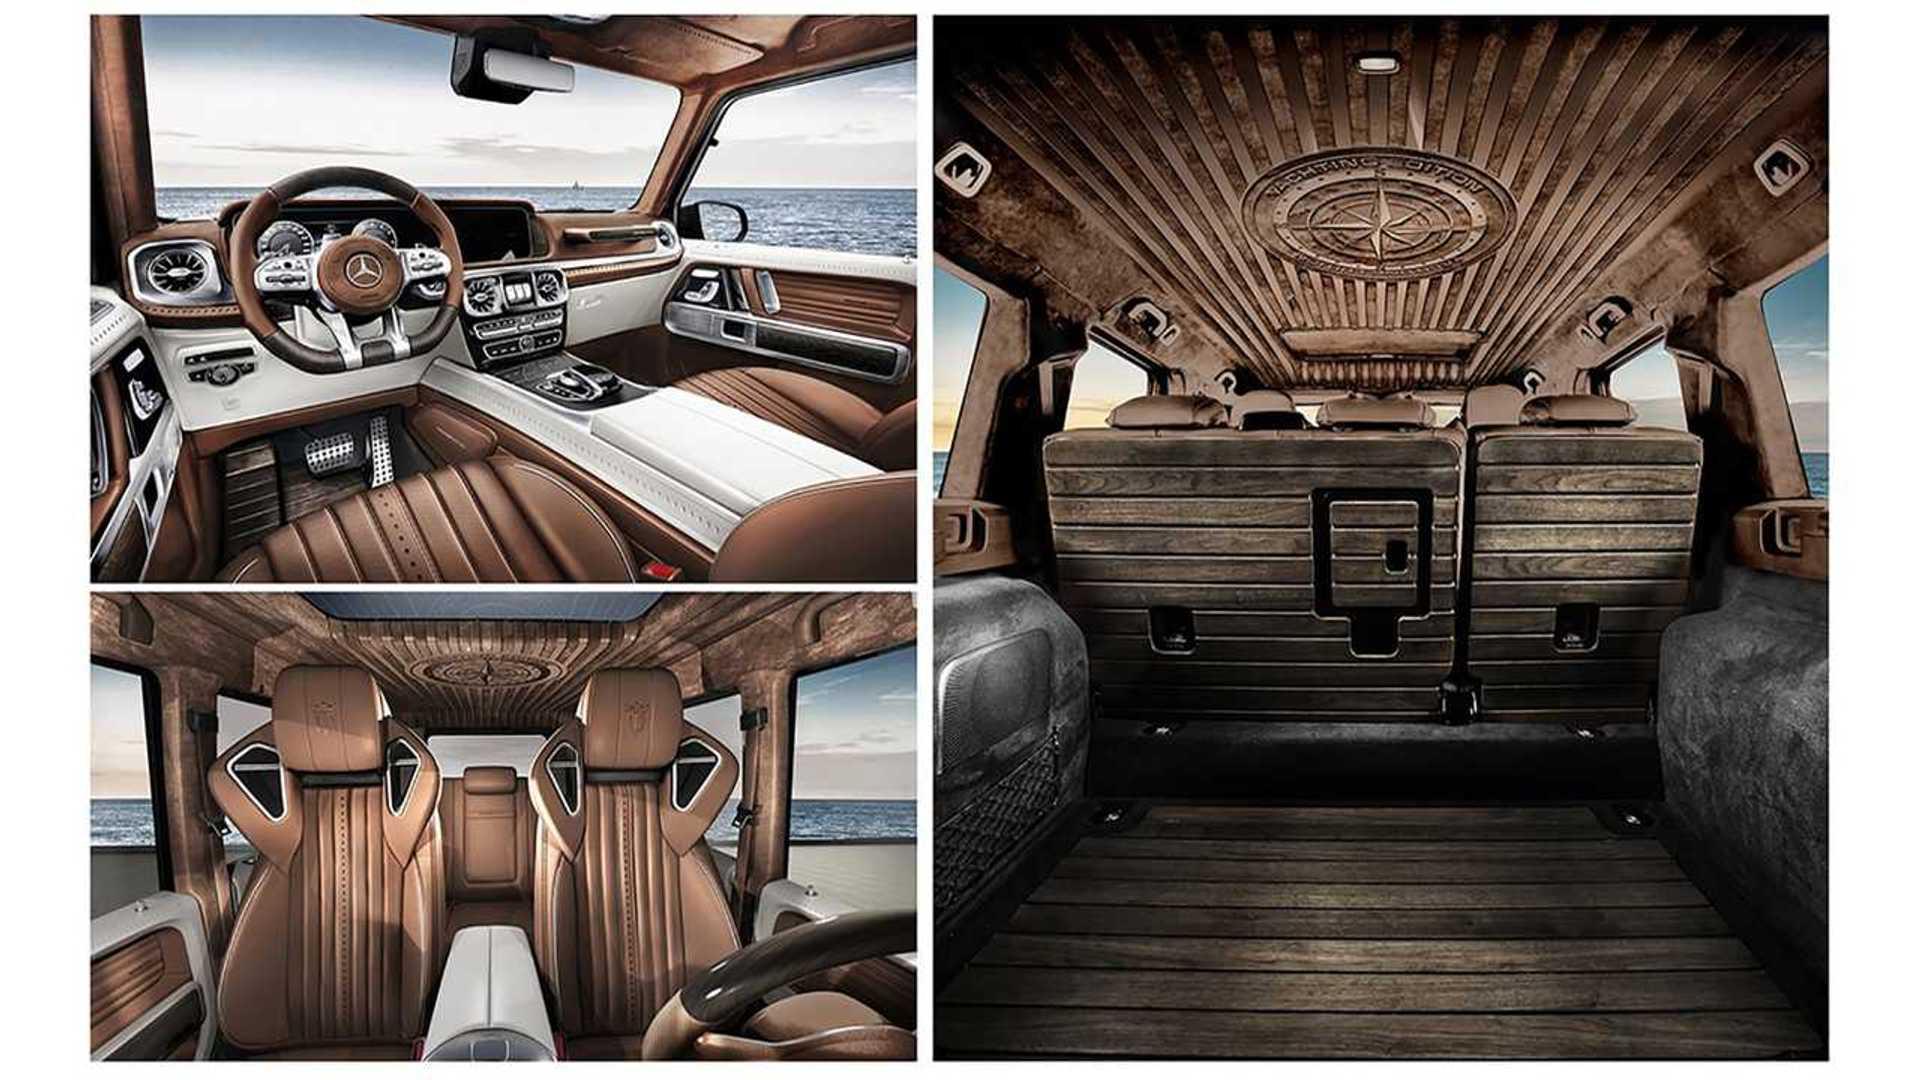 Mercedes Amg G63 Receives Opulent Wood Interior From Carlex Design